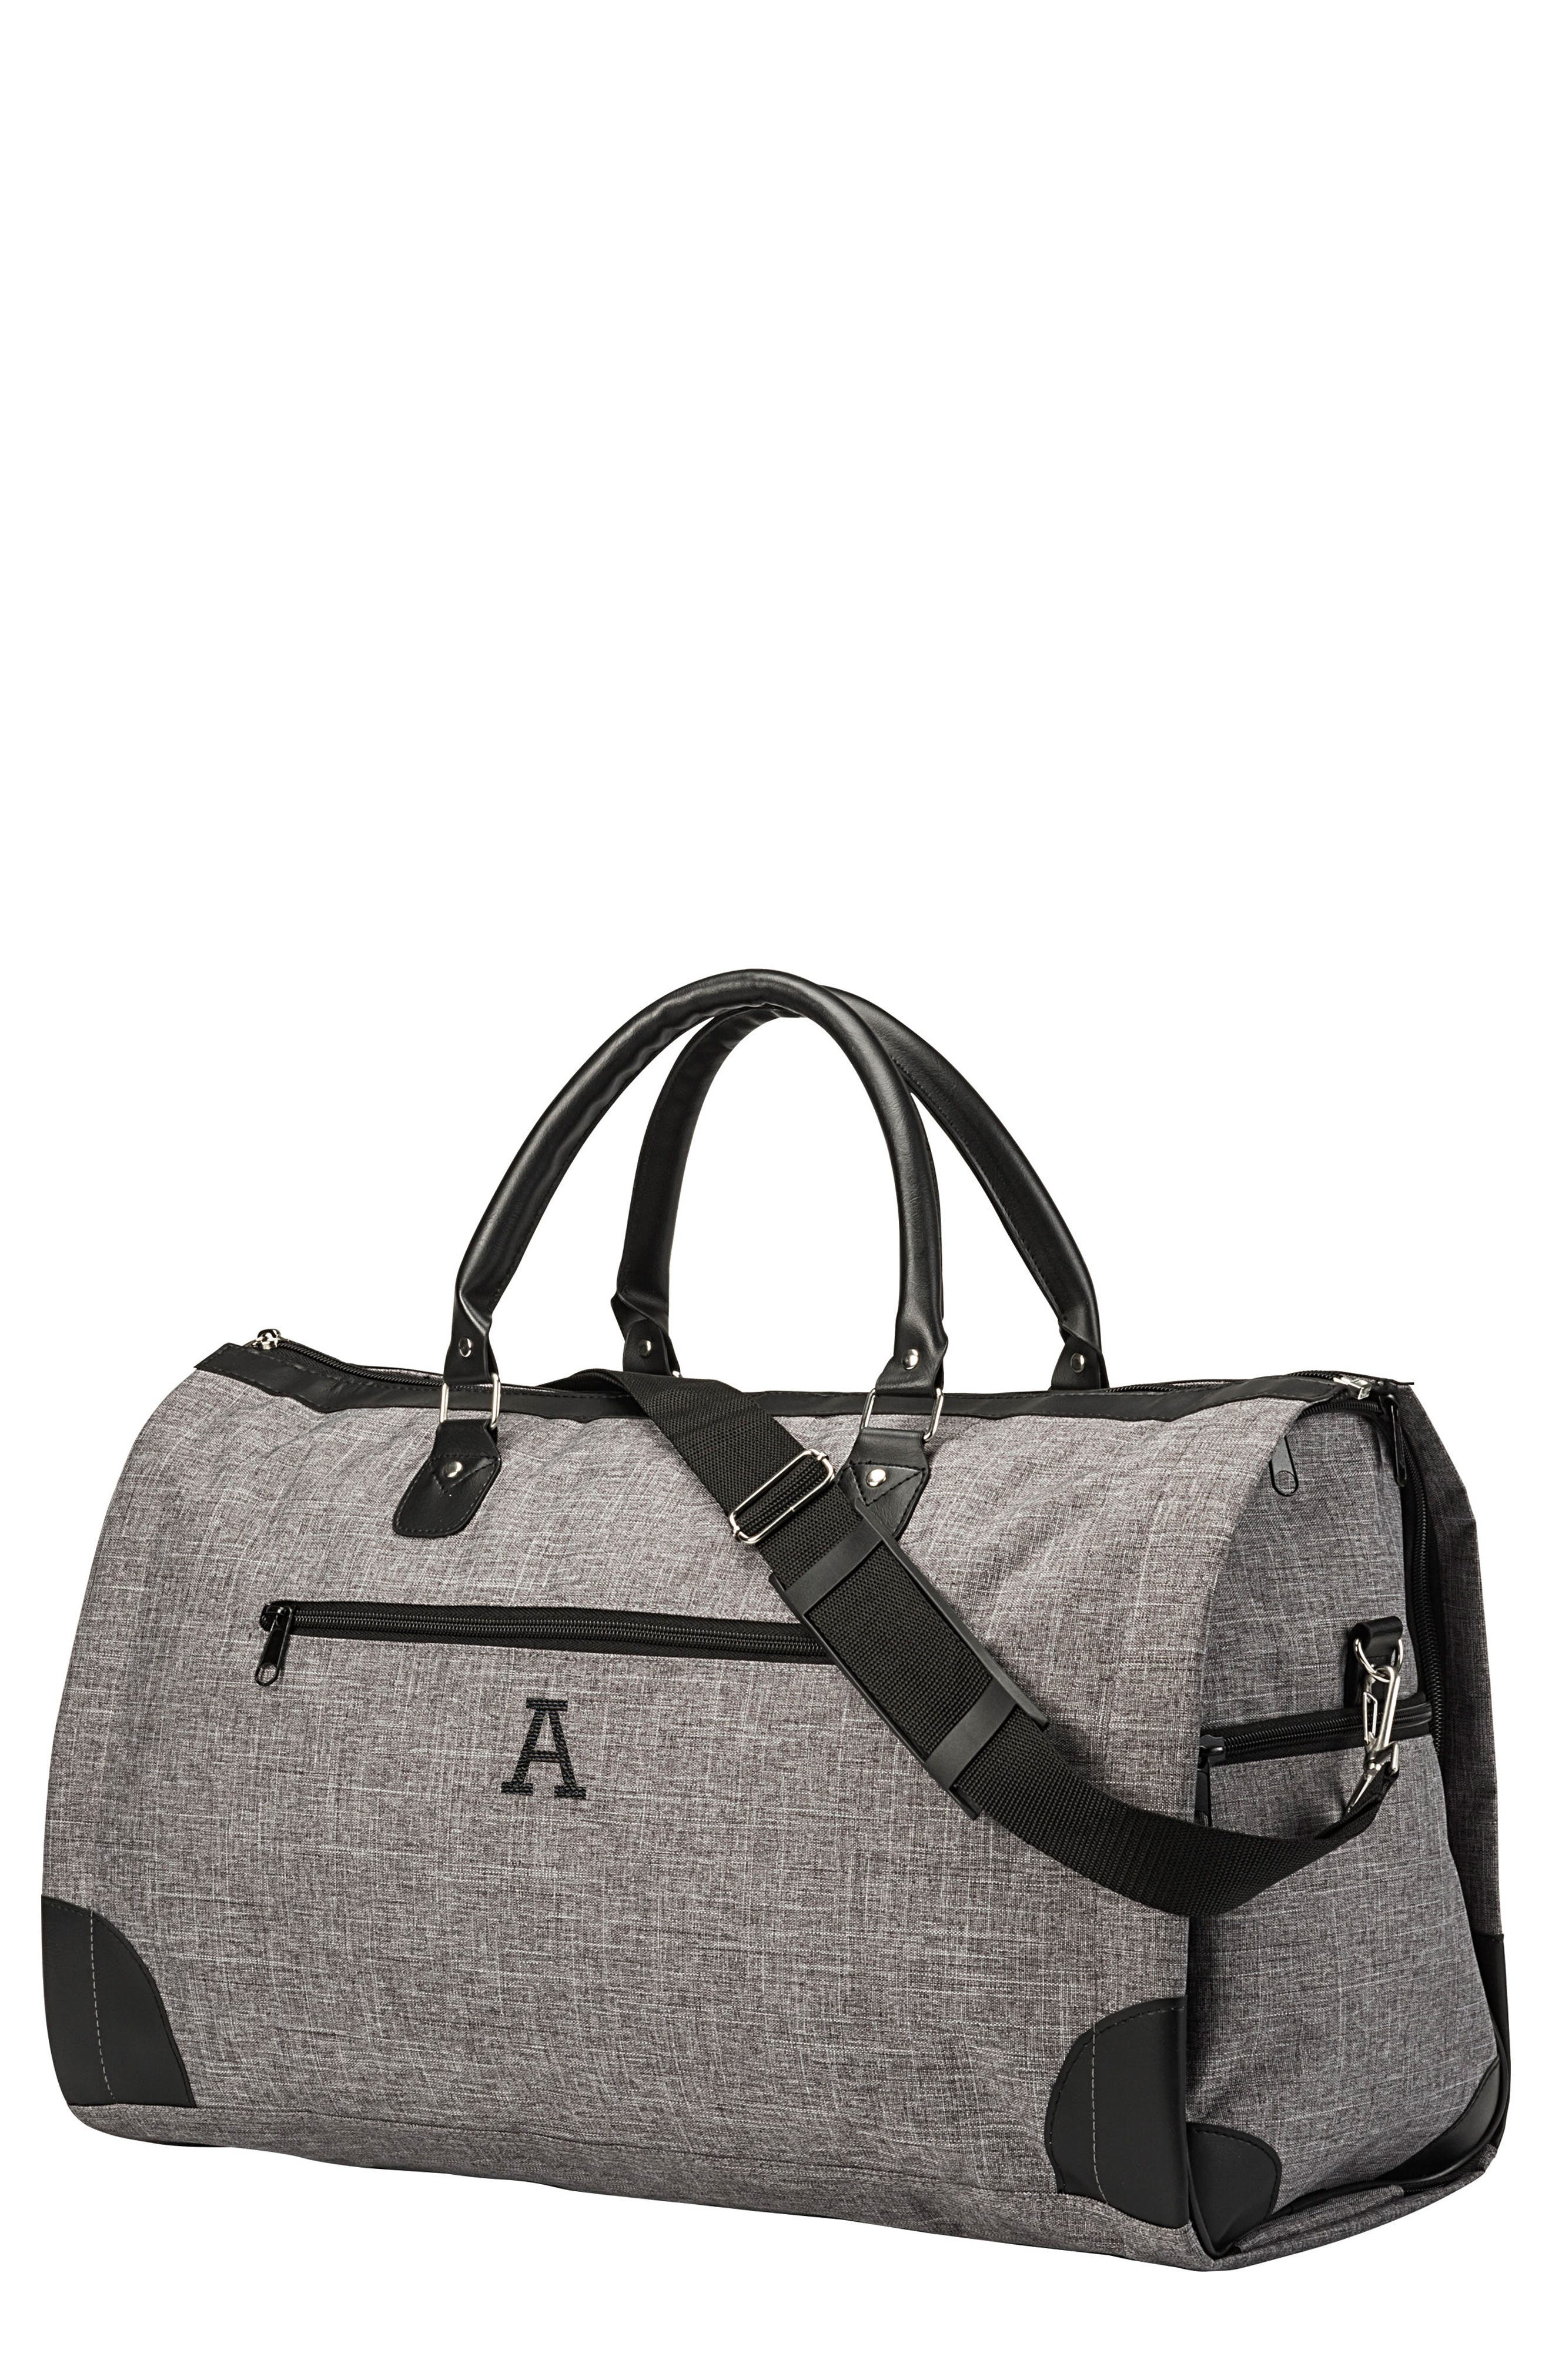 Monogram Duffel/Garment Bag,                             Main thumbnail 1, color,                             GREY A